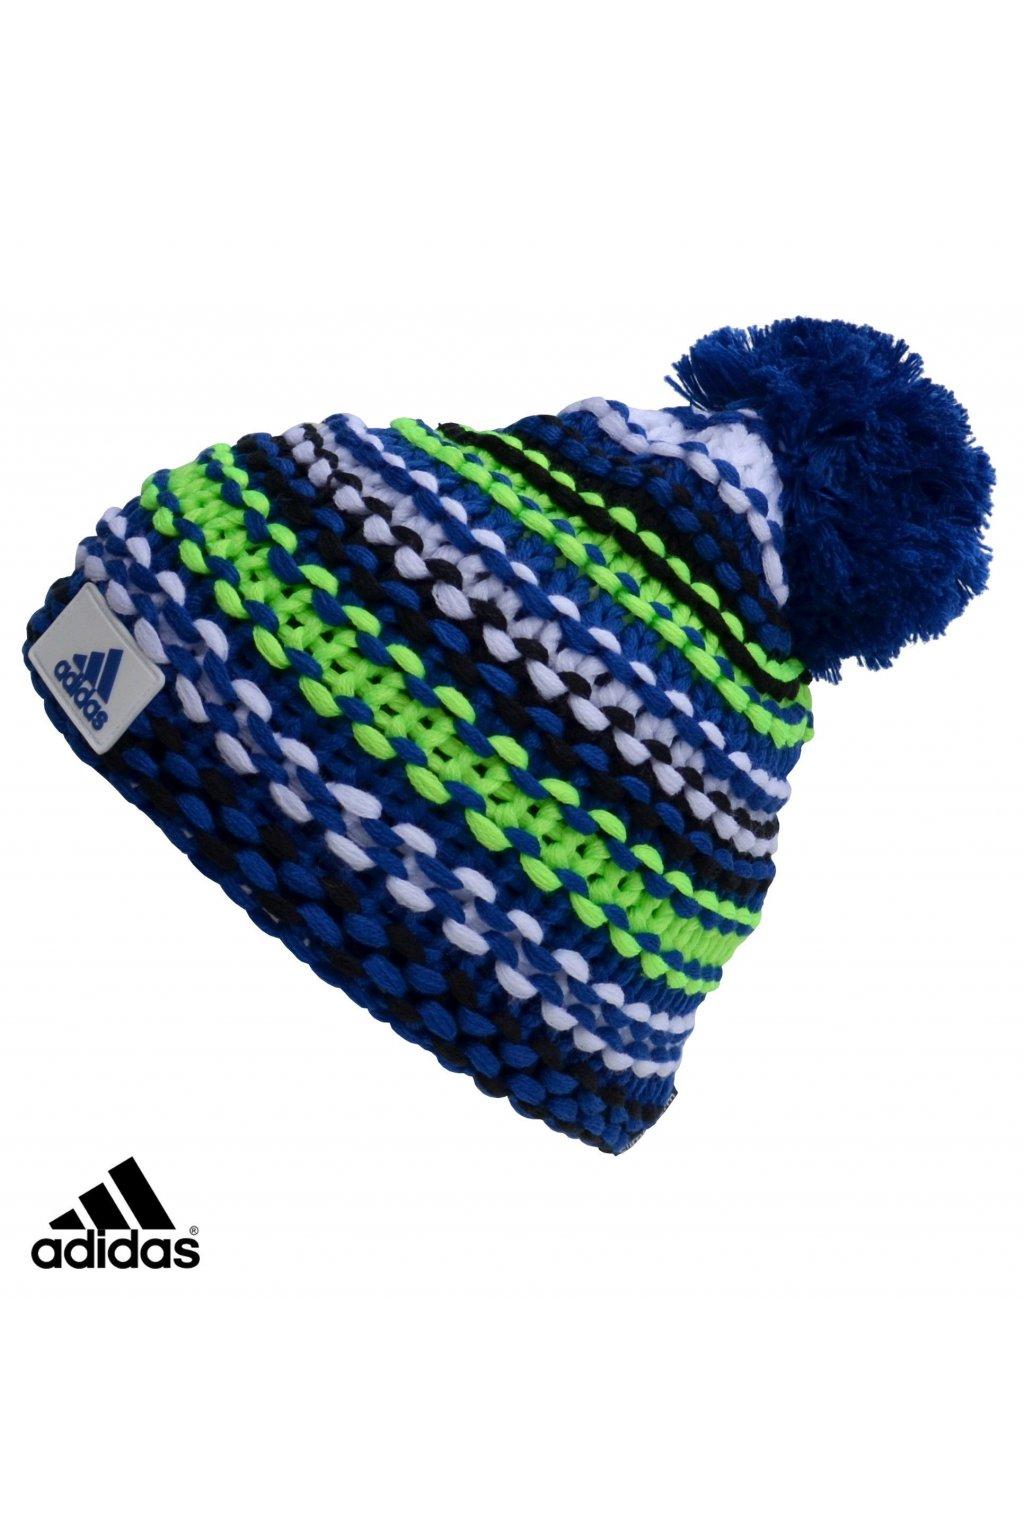 m67298 zimna ciapka adidas yb chunky